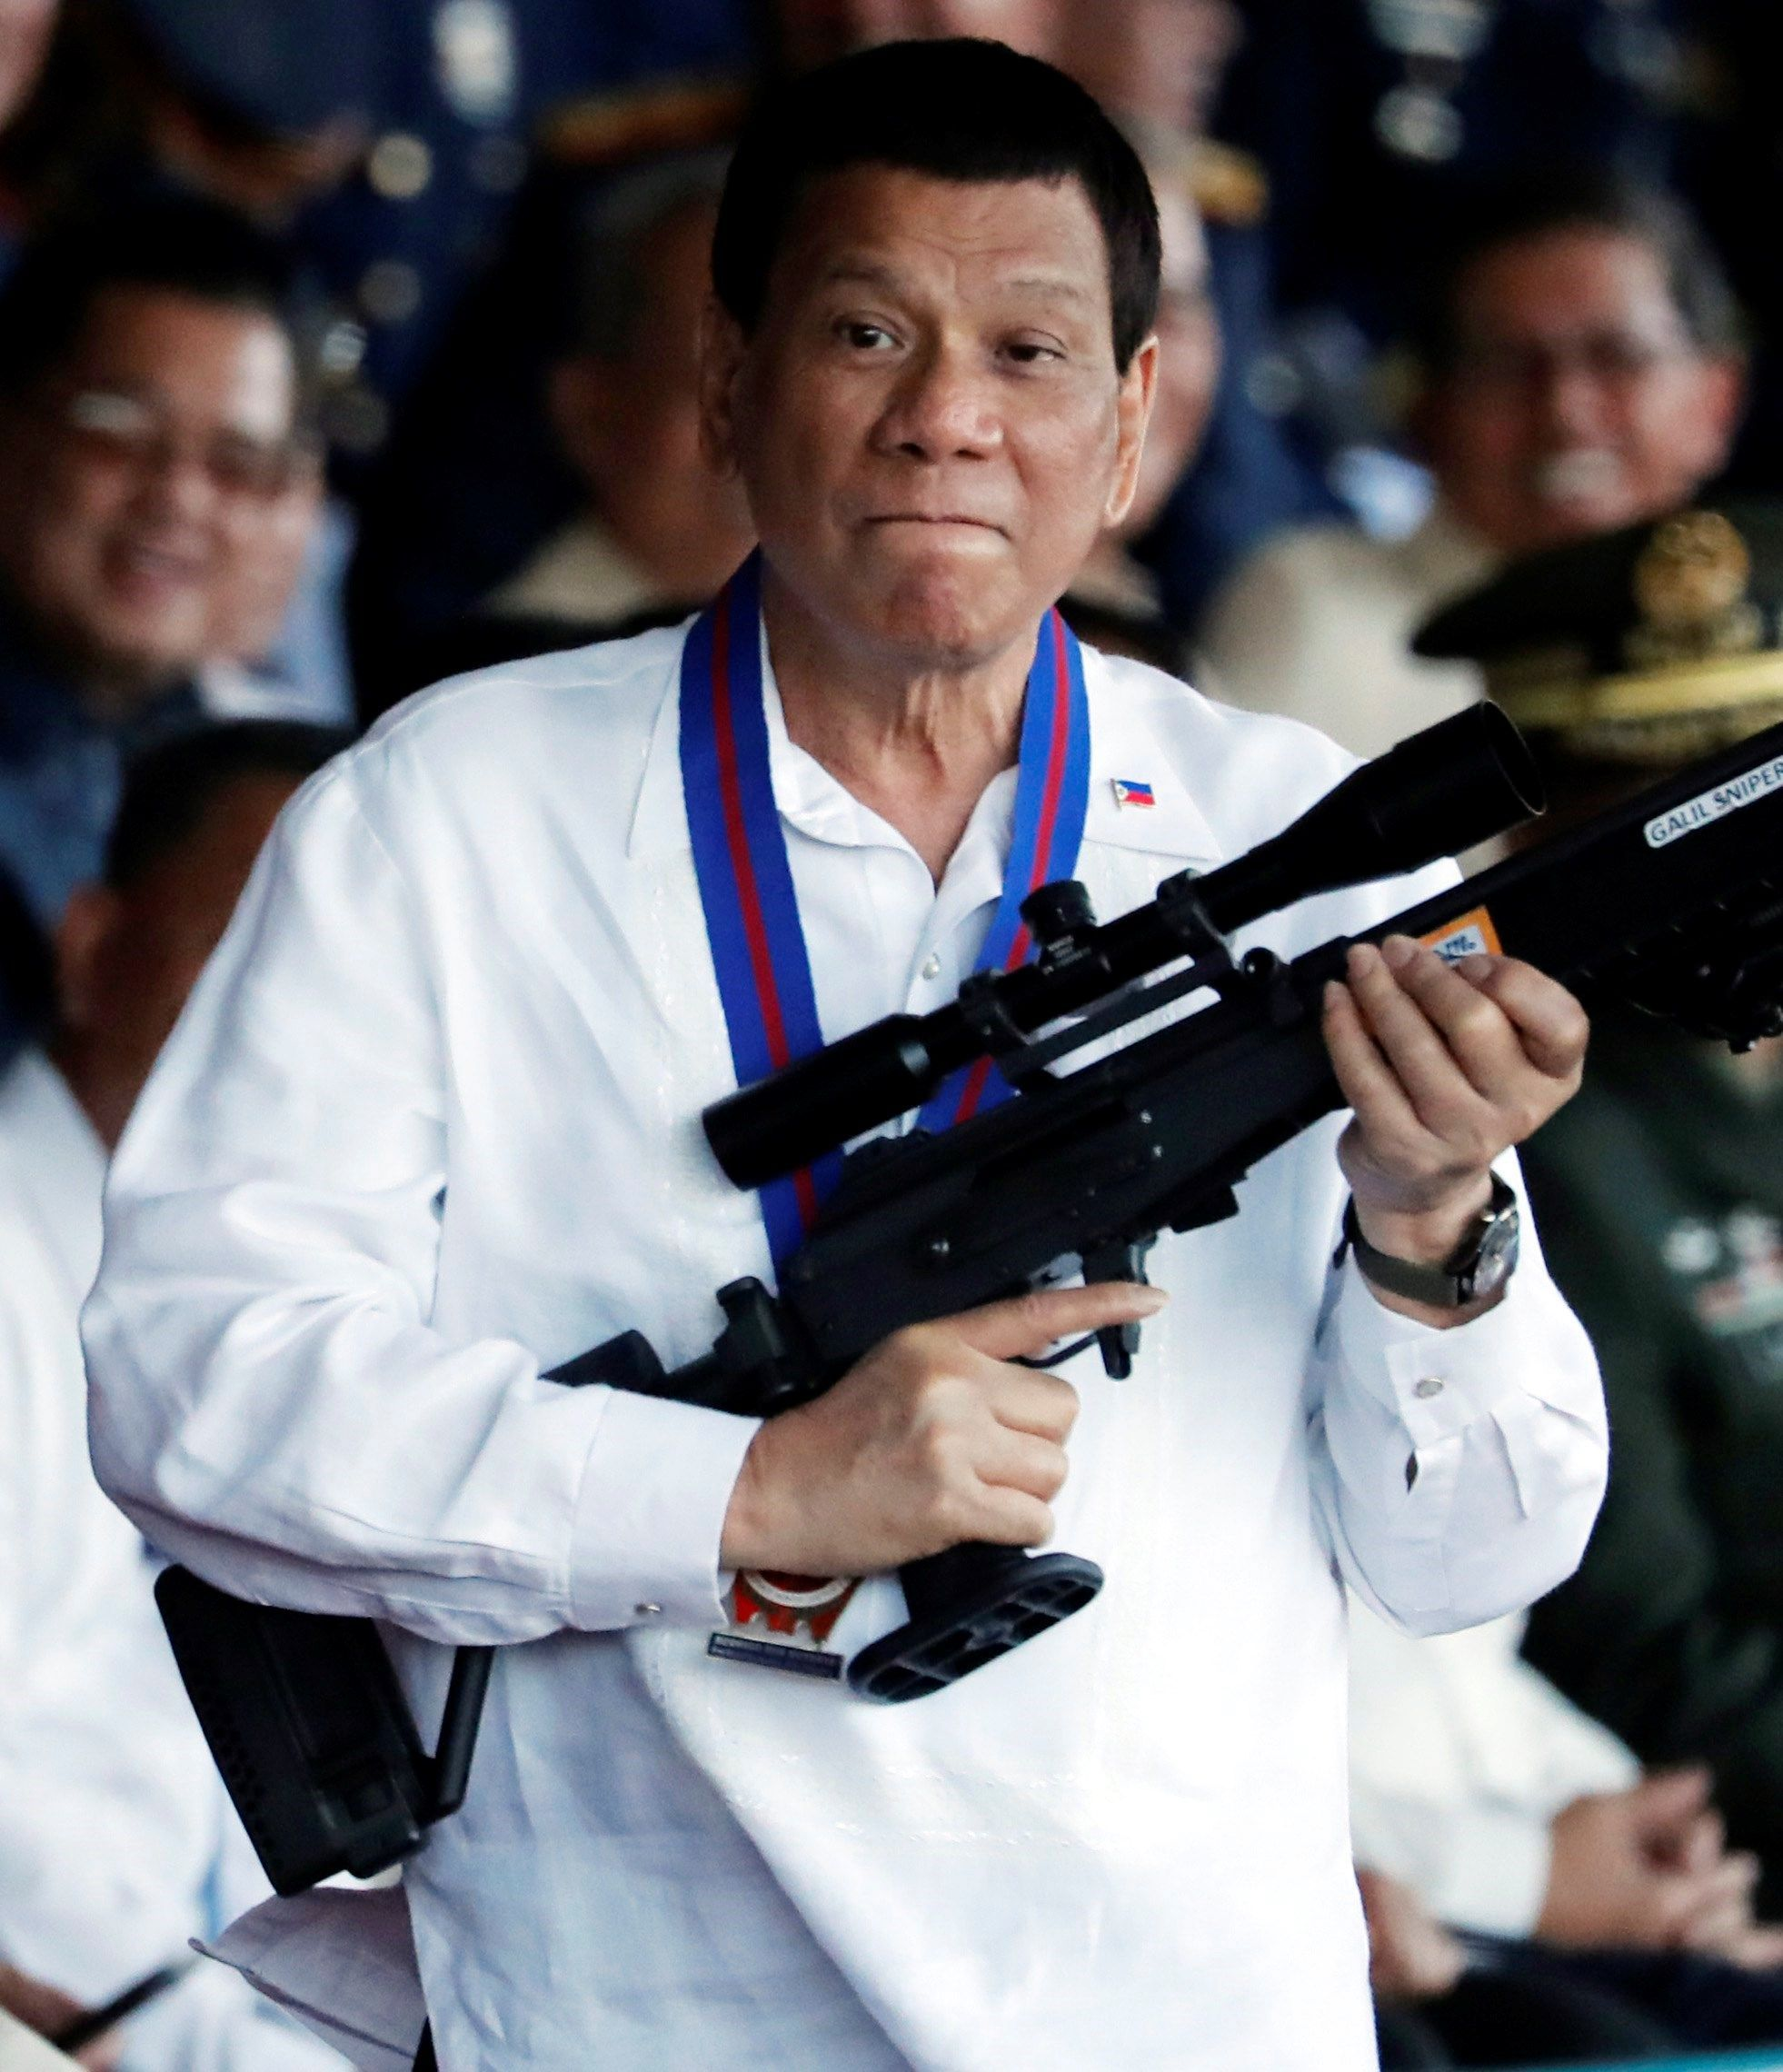 Presidente de Filipinas anima a matar a los obispos católicos del país